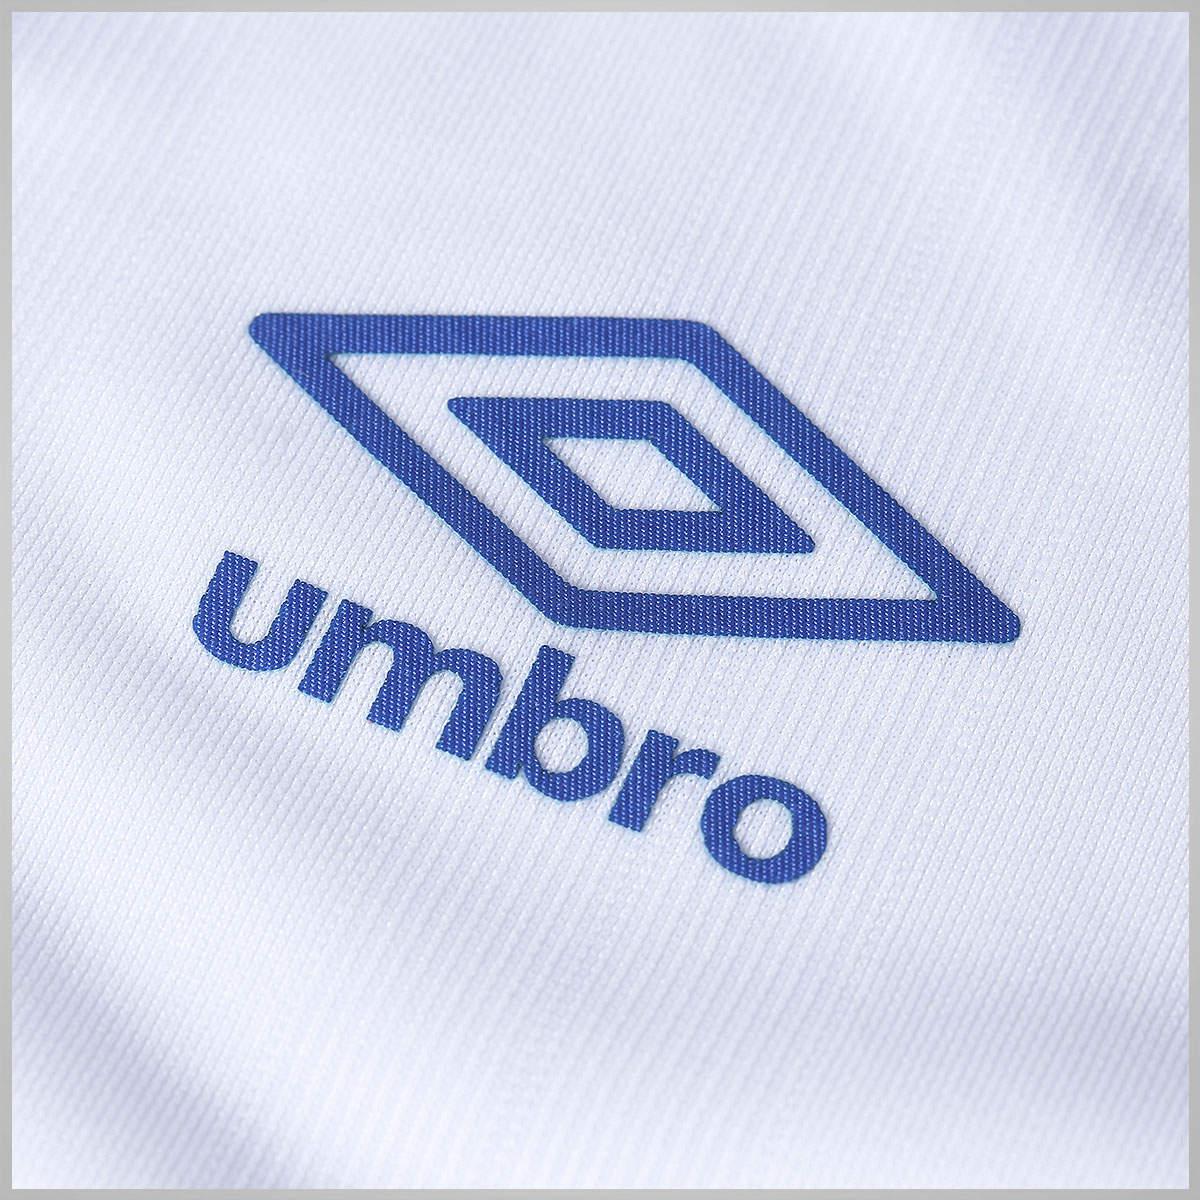 14742d48793e8 Camisa Cruzeiro 2016 II s nº Feminina Branca - Umbro - Camarote do ...